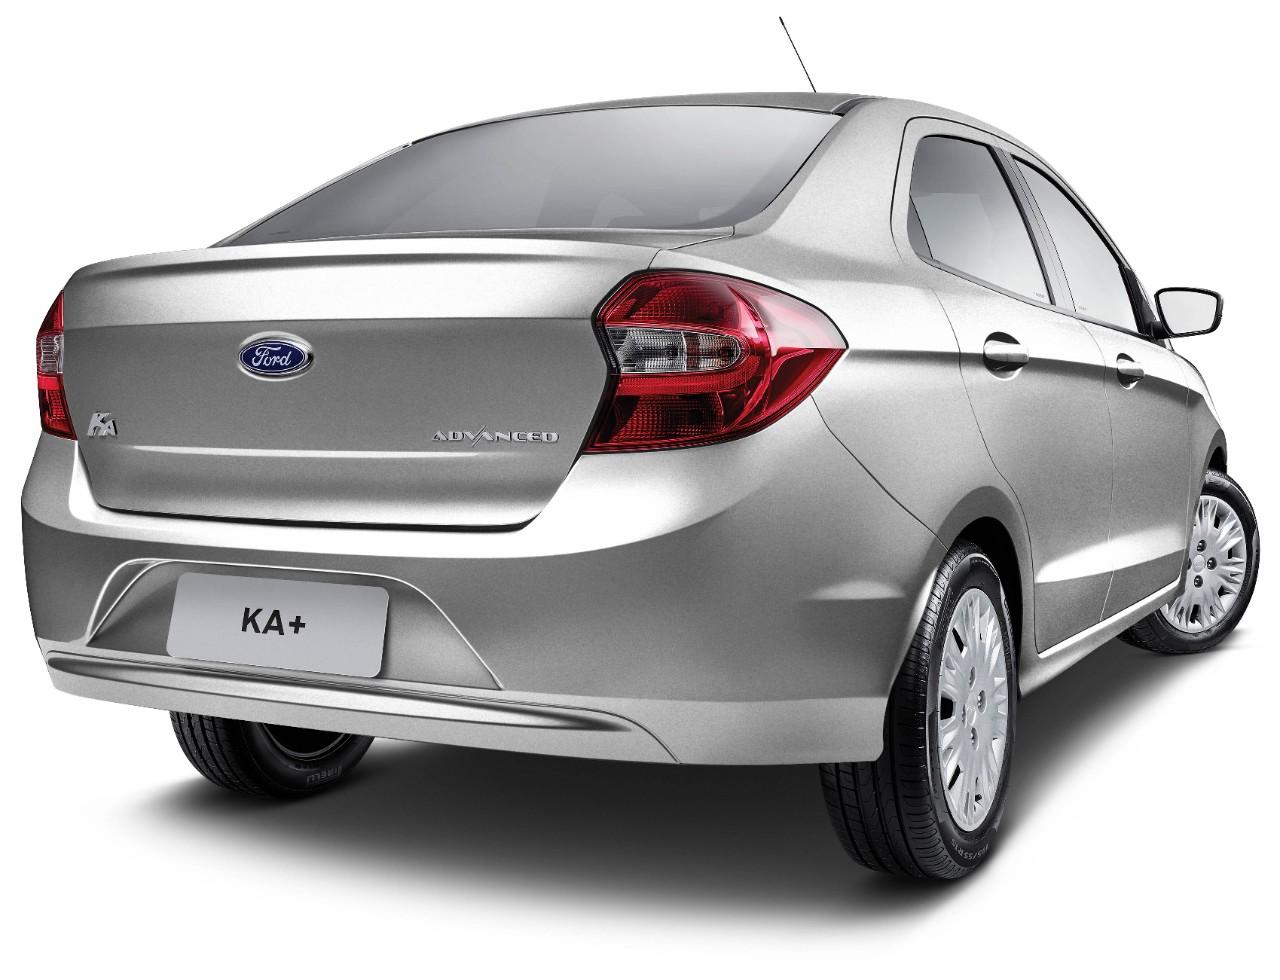 Ford ka advanced 2018